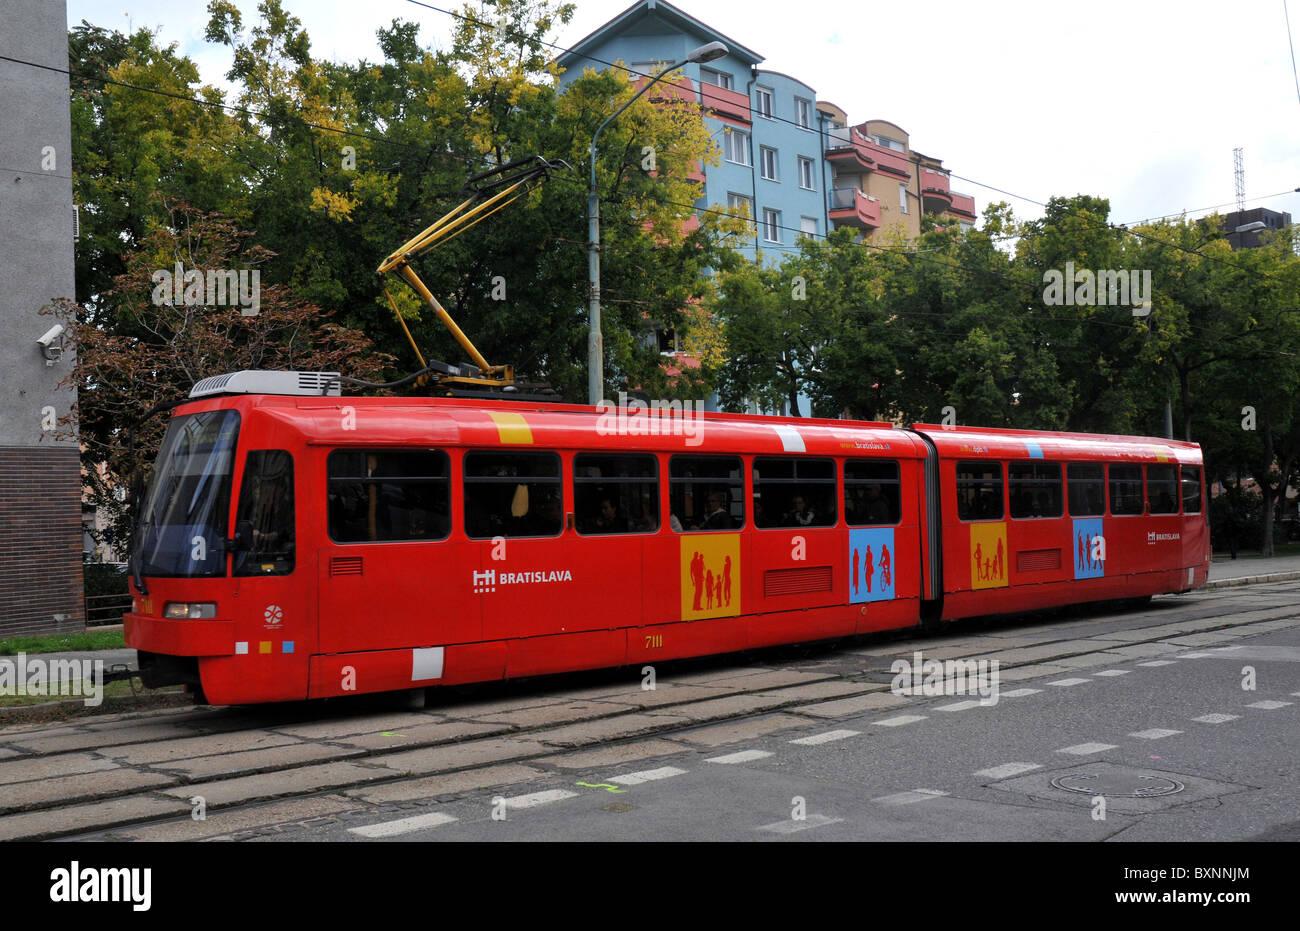 Tram, Bratislava, Slovakia, Europe - Stock Image